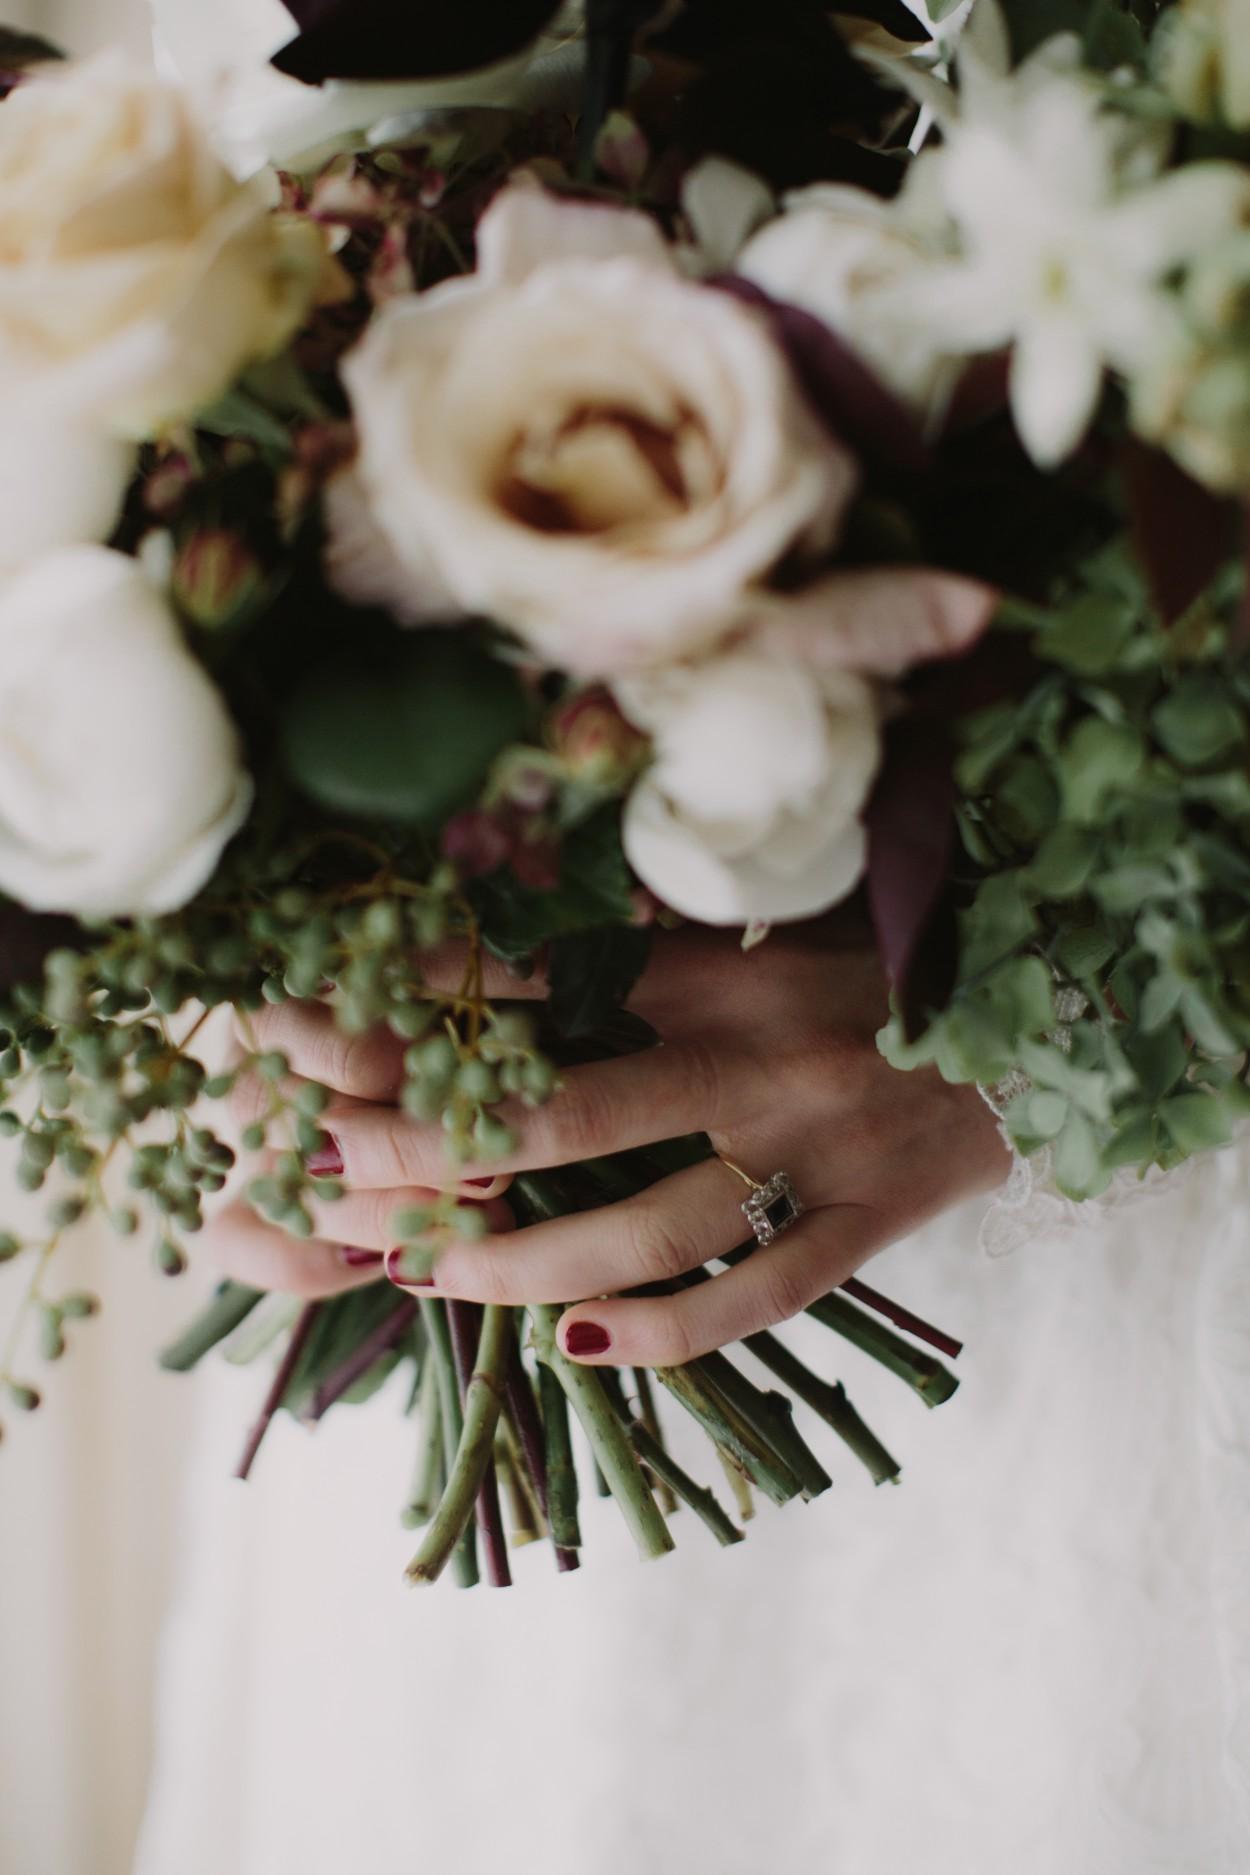 I-Got-You-Babe-Weddings-The-019George-Ballroom-St-Kilda-Wedding-Amy-Abhi.jpg